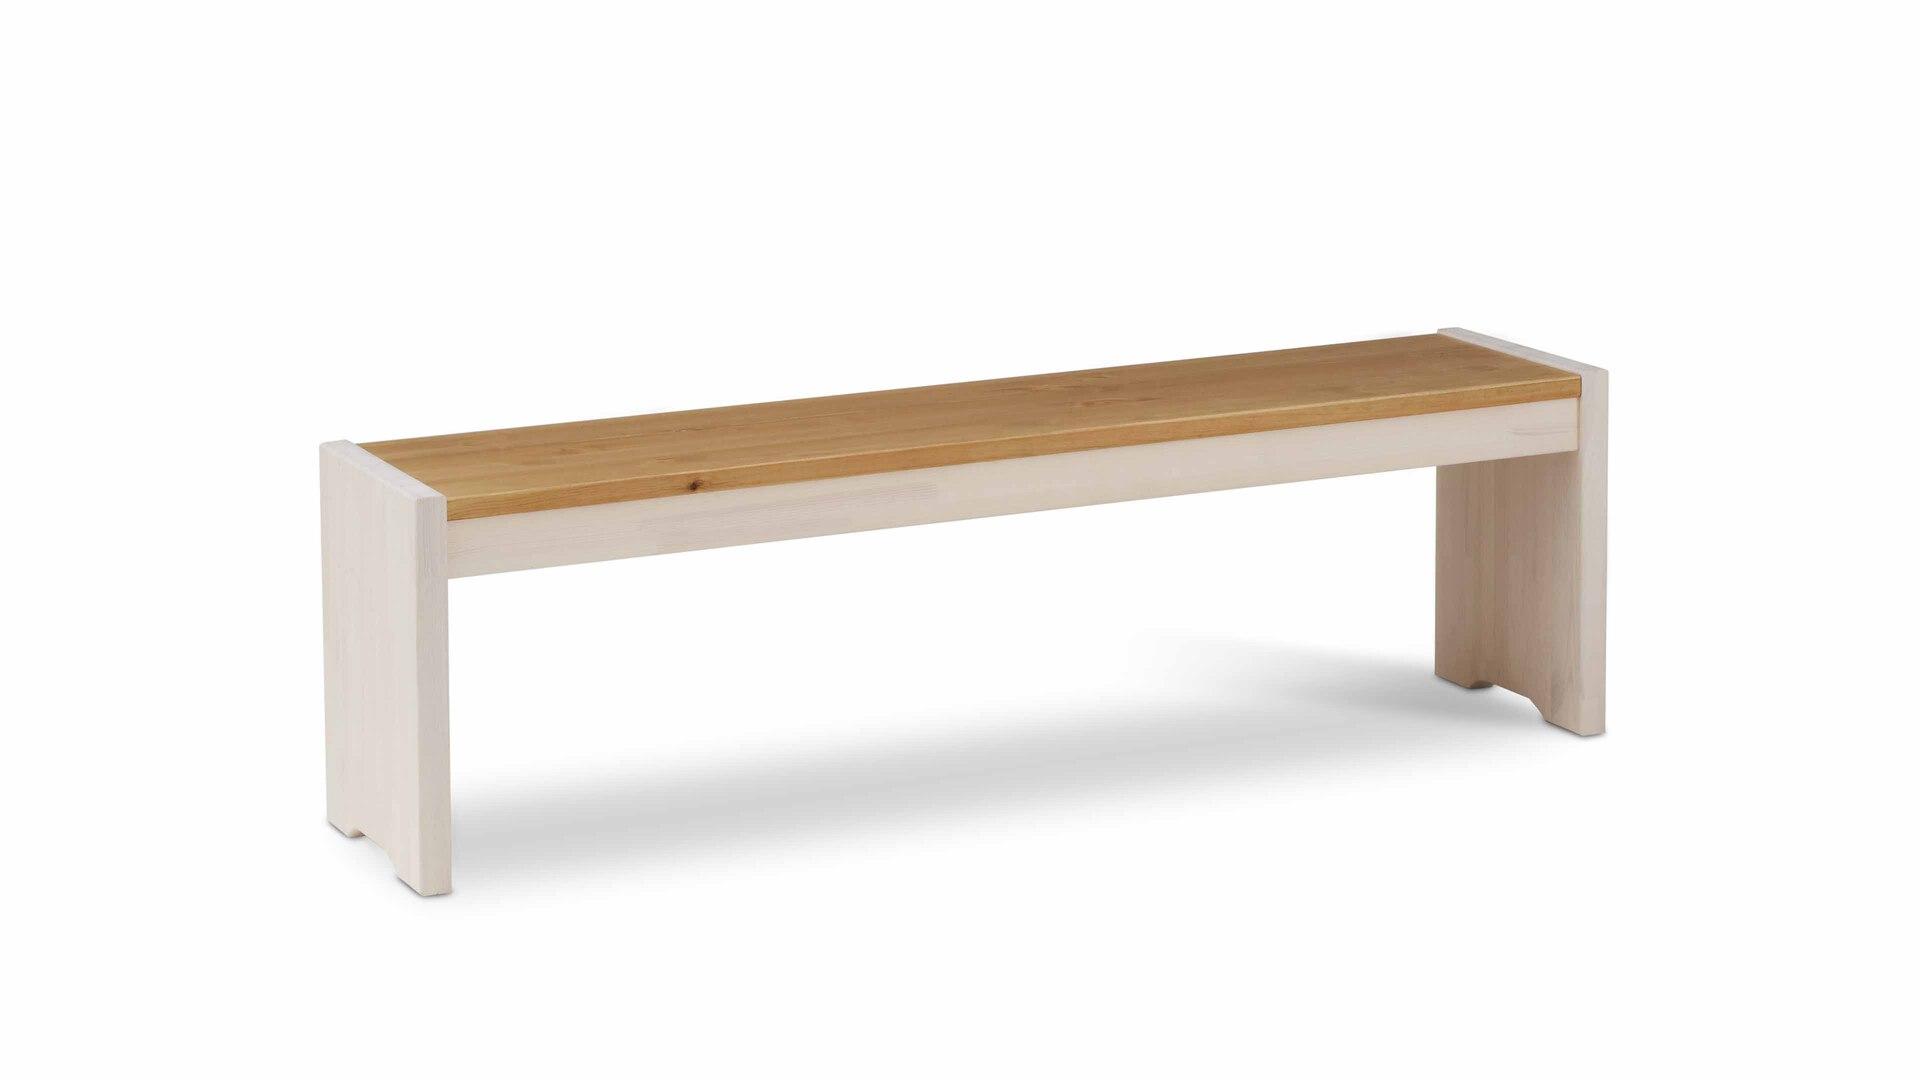 Holzbank als attraktives Sitzmöbel